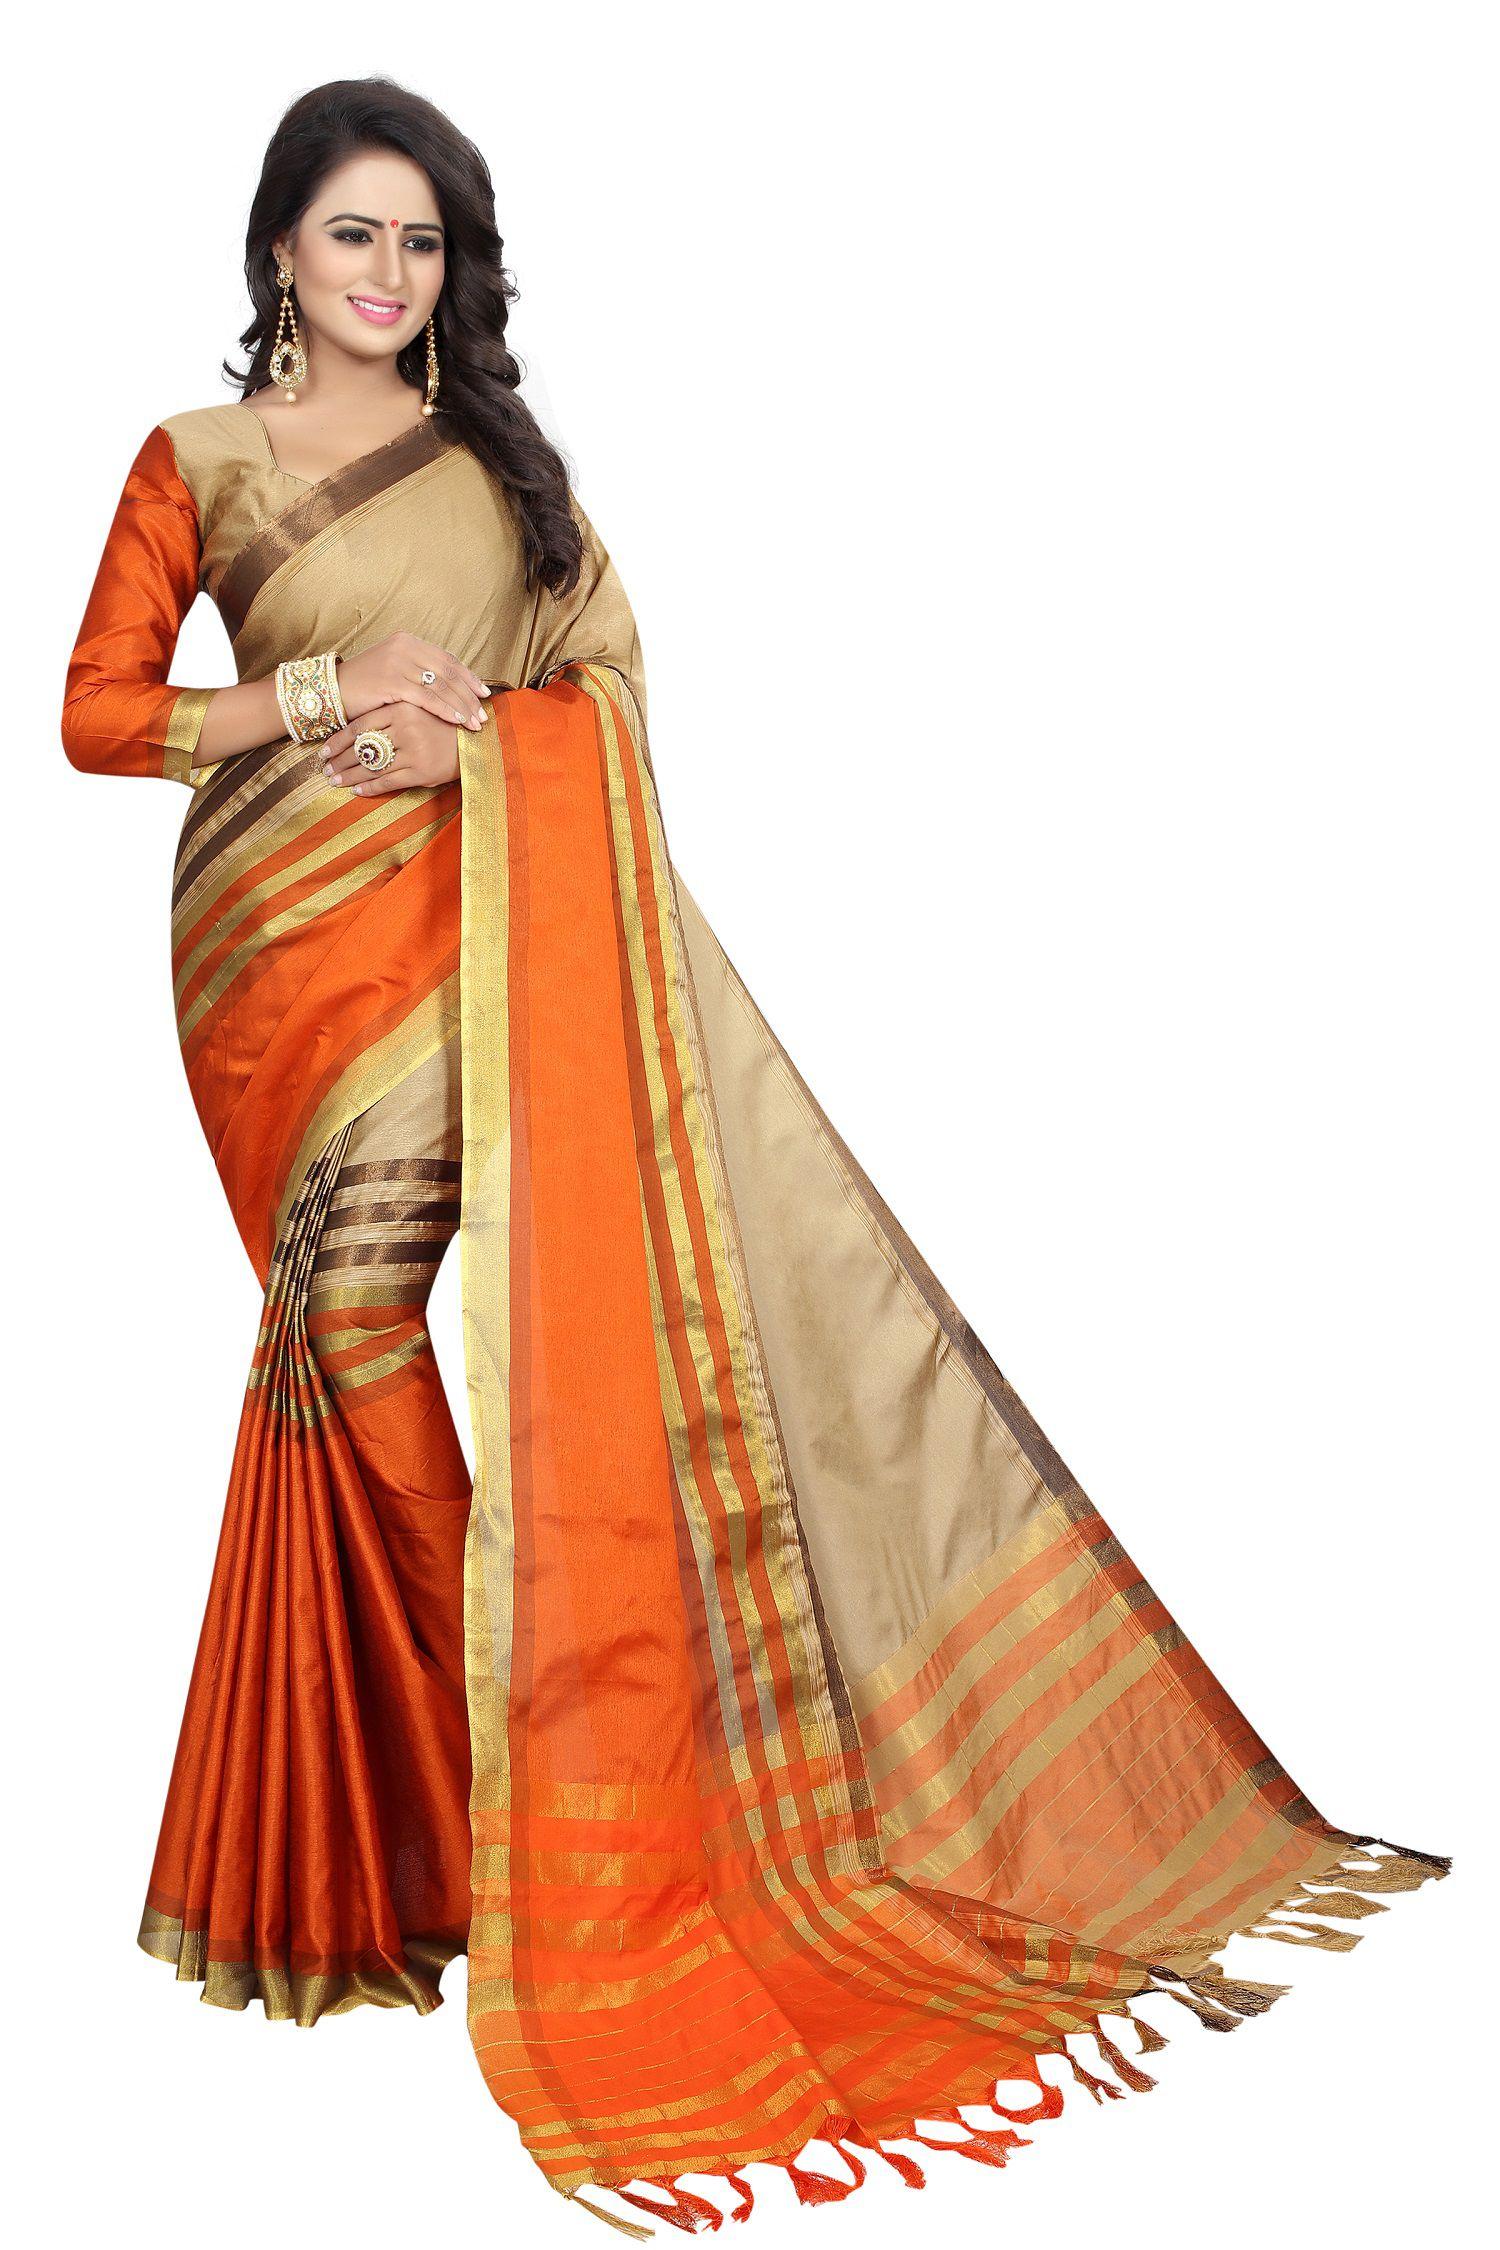 Malhari Multicoloured Cotton Silk Saree